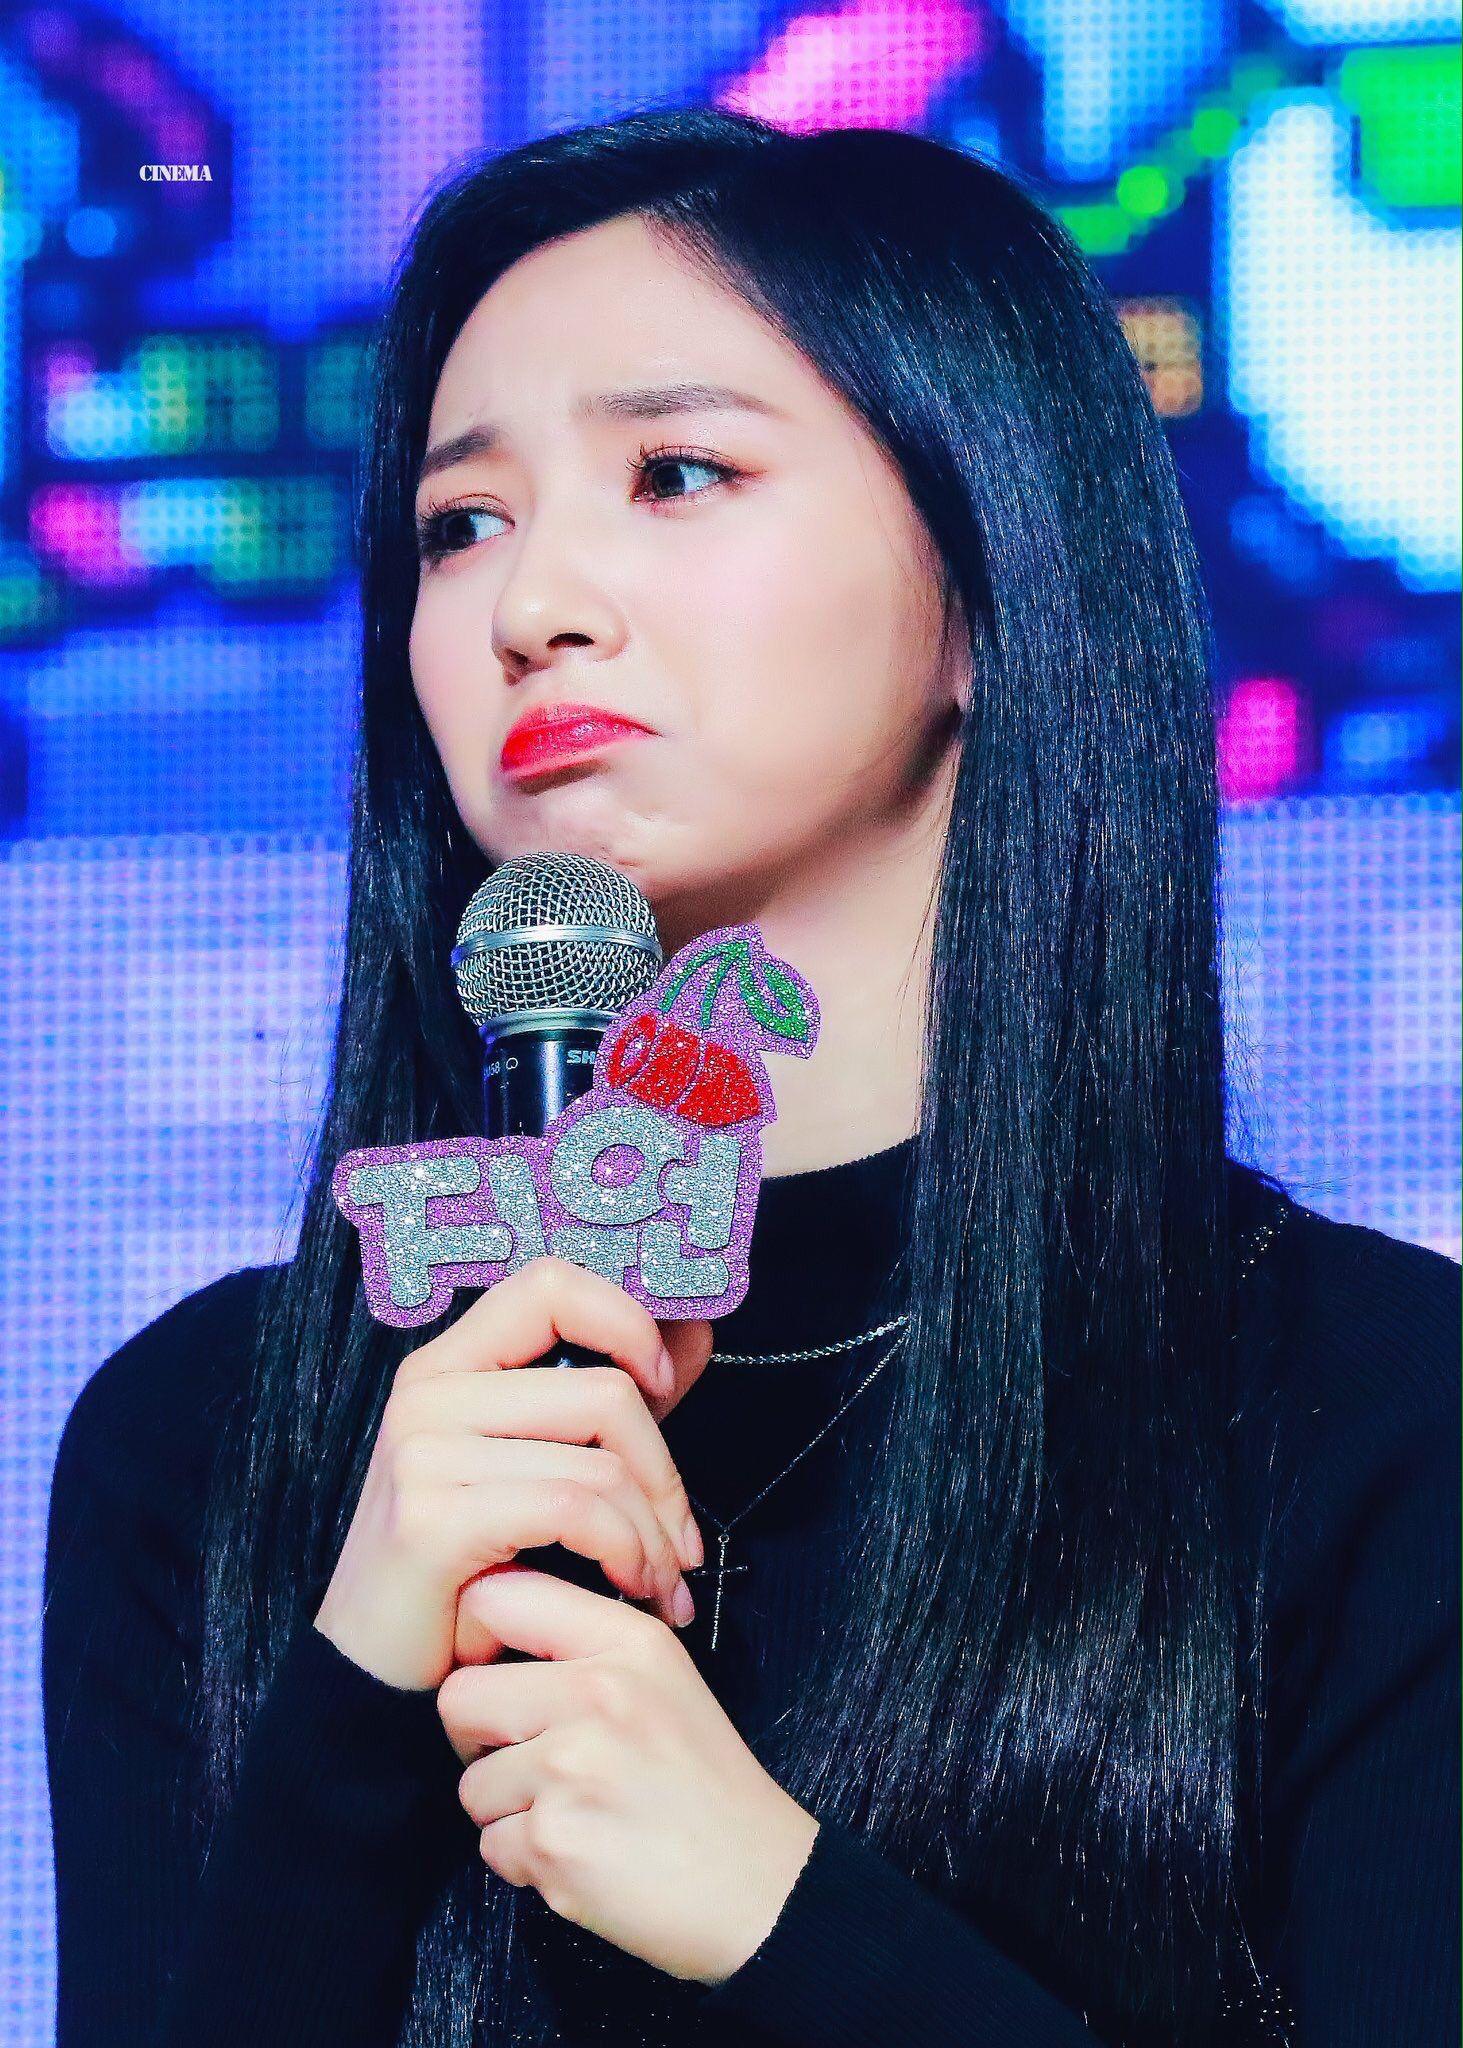 Pin On Jiwon Only